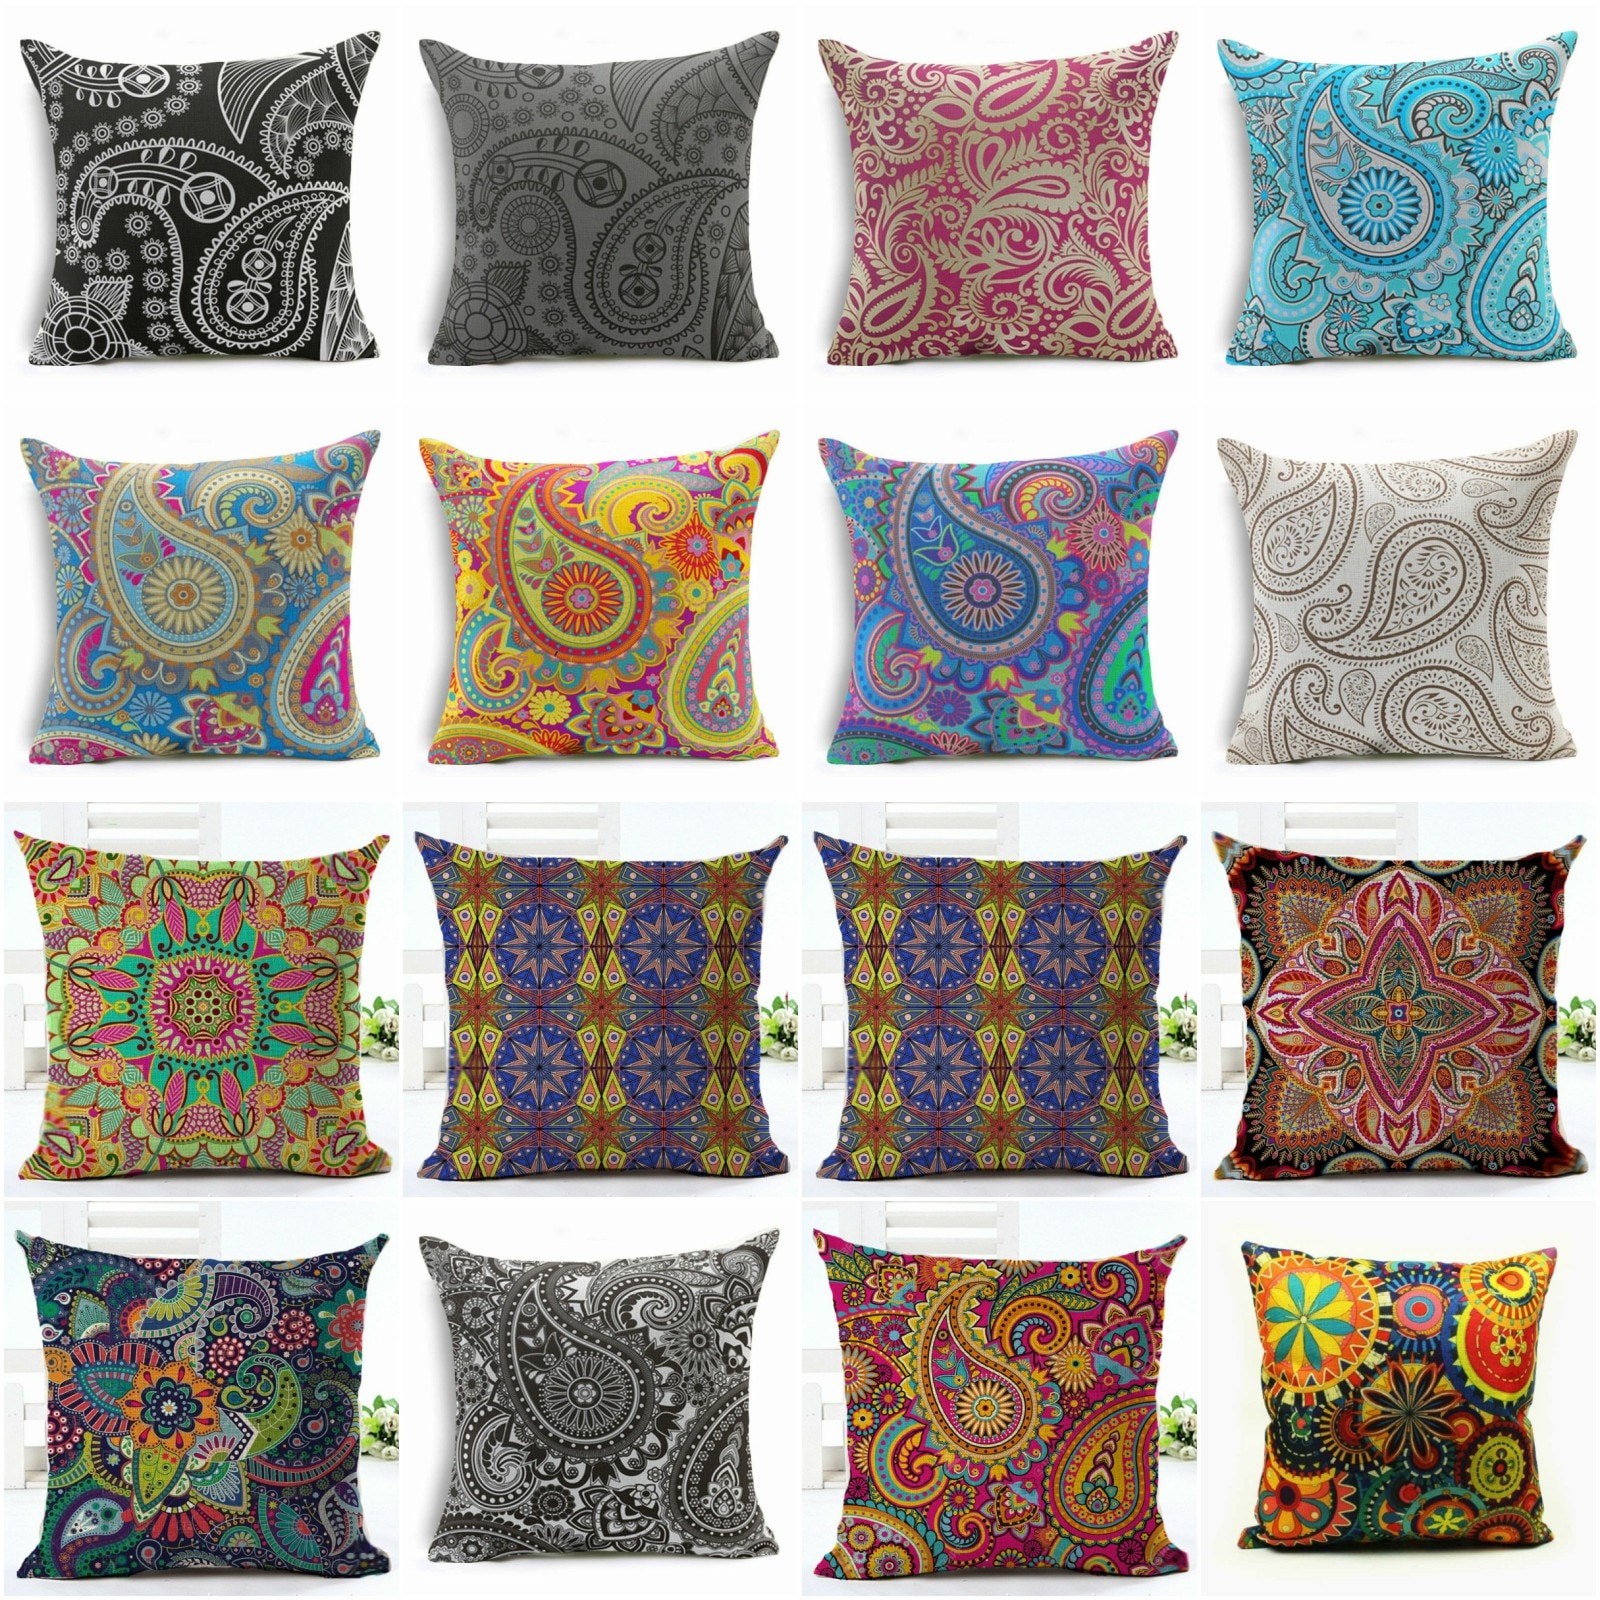 HGLEGYW bohemio geométrico Paisley funda de almohada Throw funda de algodón de lino fundas de almohada impresas Oficina hogar textil